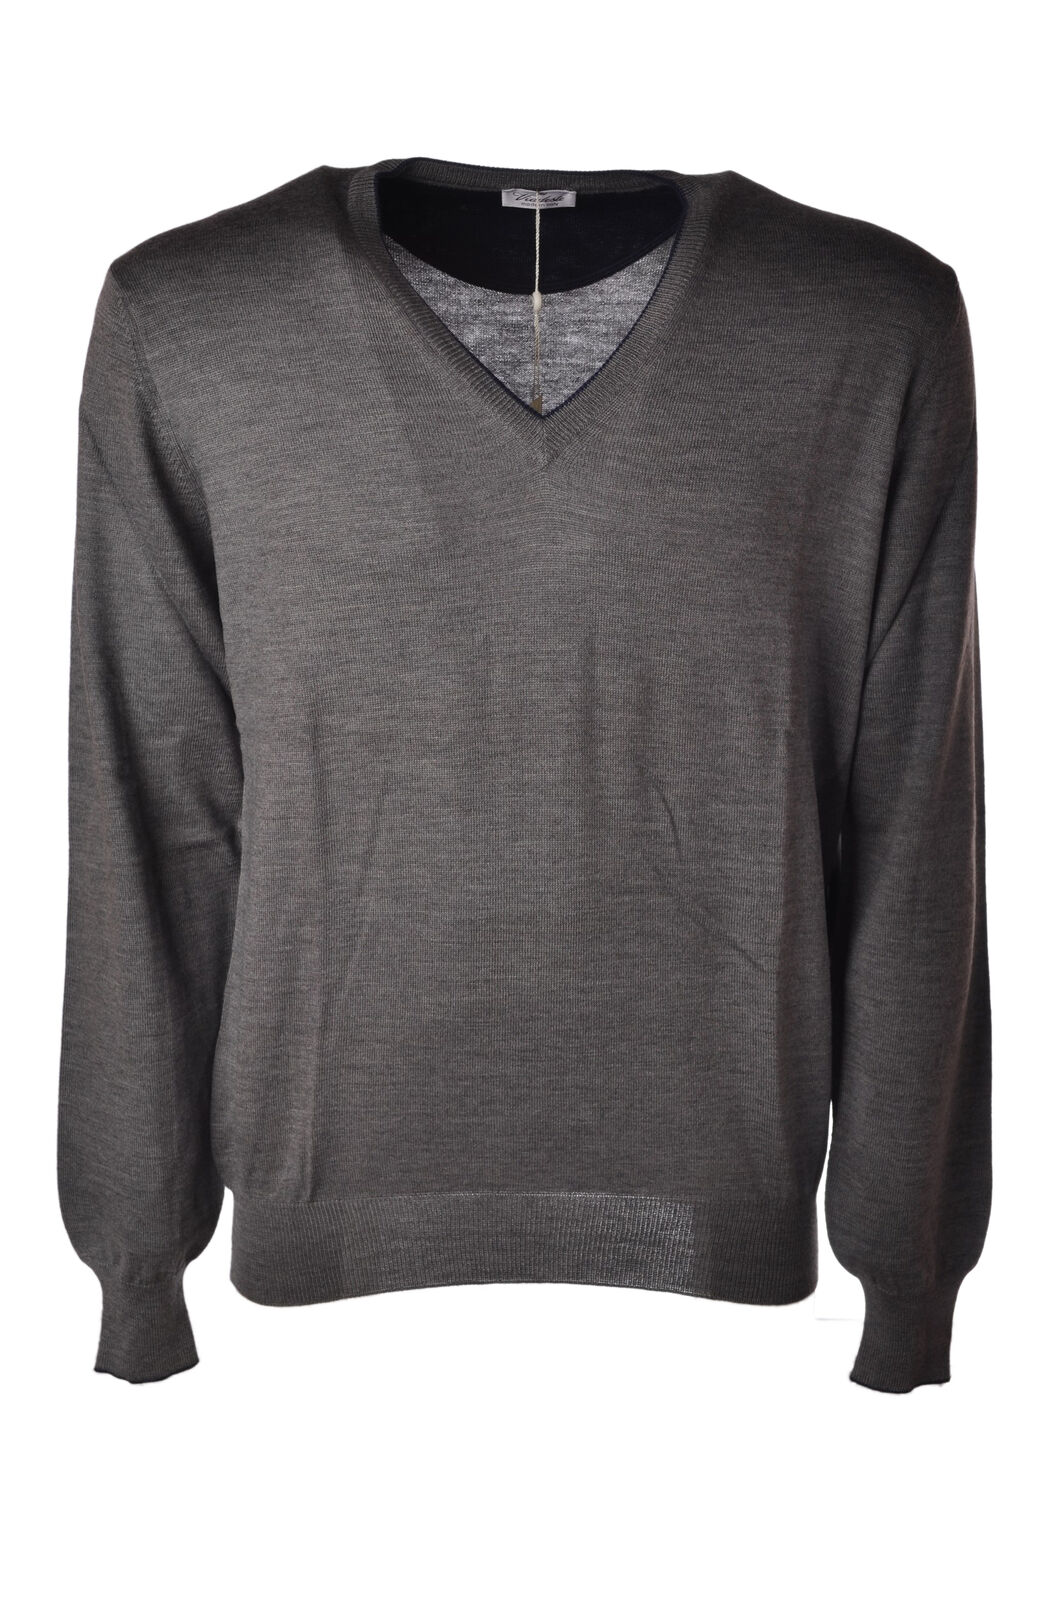 Viadeste  -  Sweaters - Male - Grau - 4666221A181024